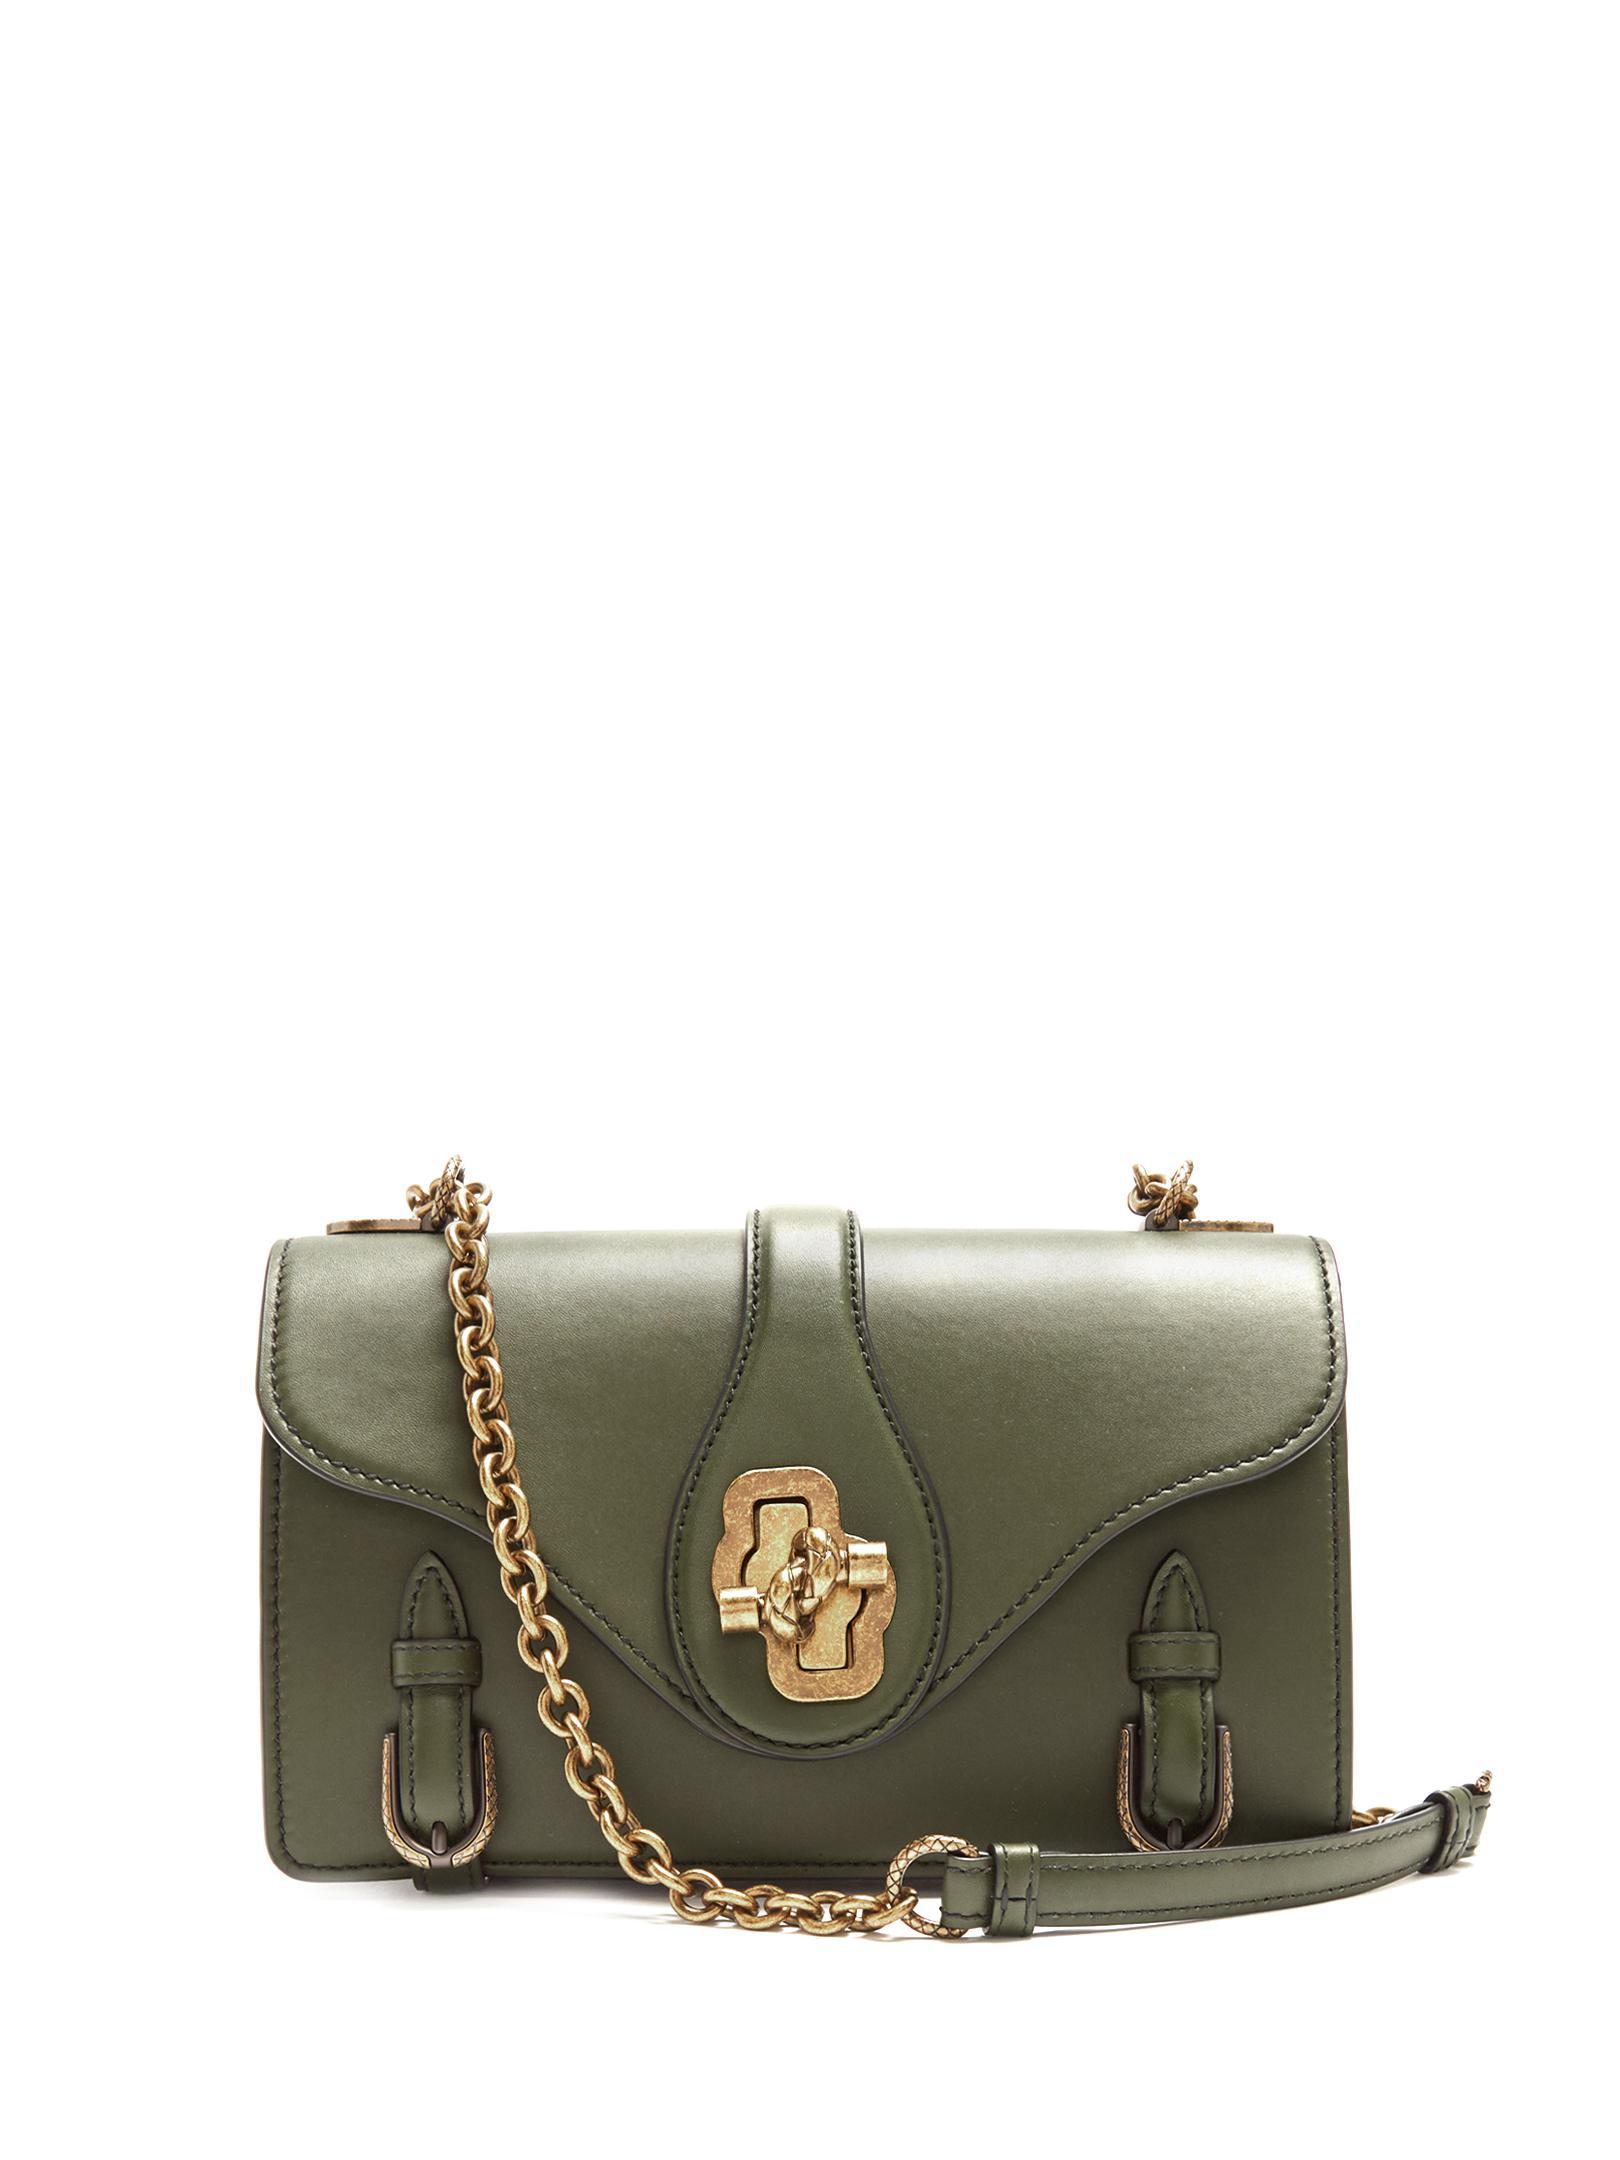 Bottega Veneta City Knot Leather Shoulder Bag in Green - Lyst 06d2b0dece506